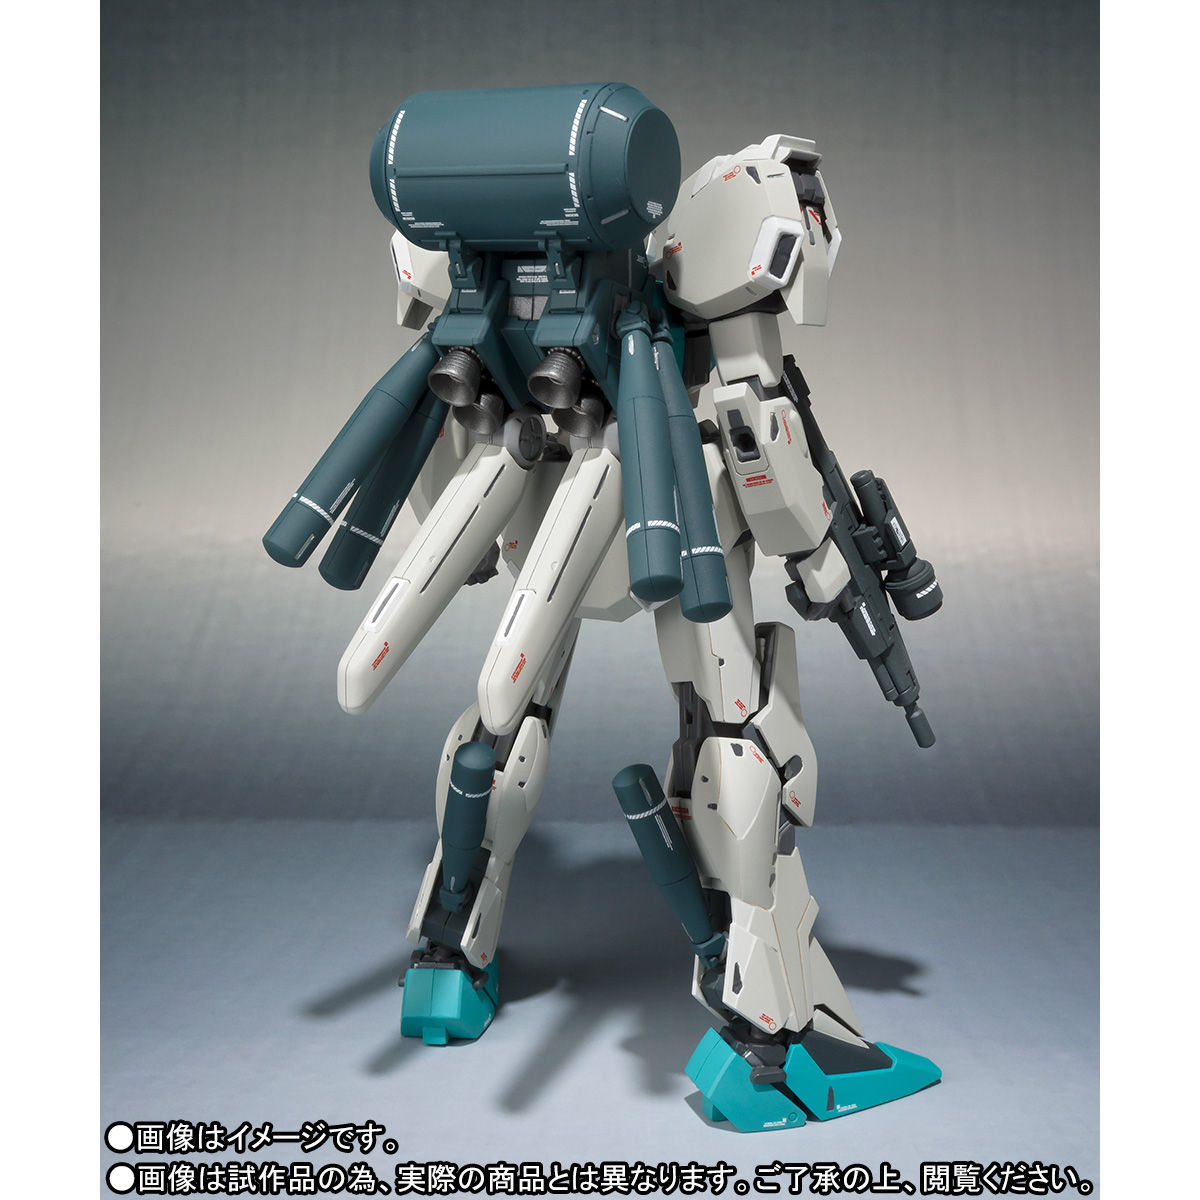 ROBOT魂(Ka signature)〈SIDE MS〉『ネロ(月面降下仕様)マーキングプラスVer.』ガンダム・センチネル 可動フィギュア-005